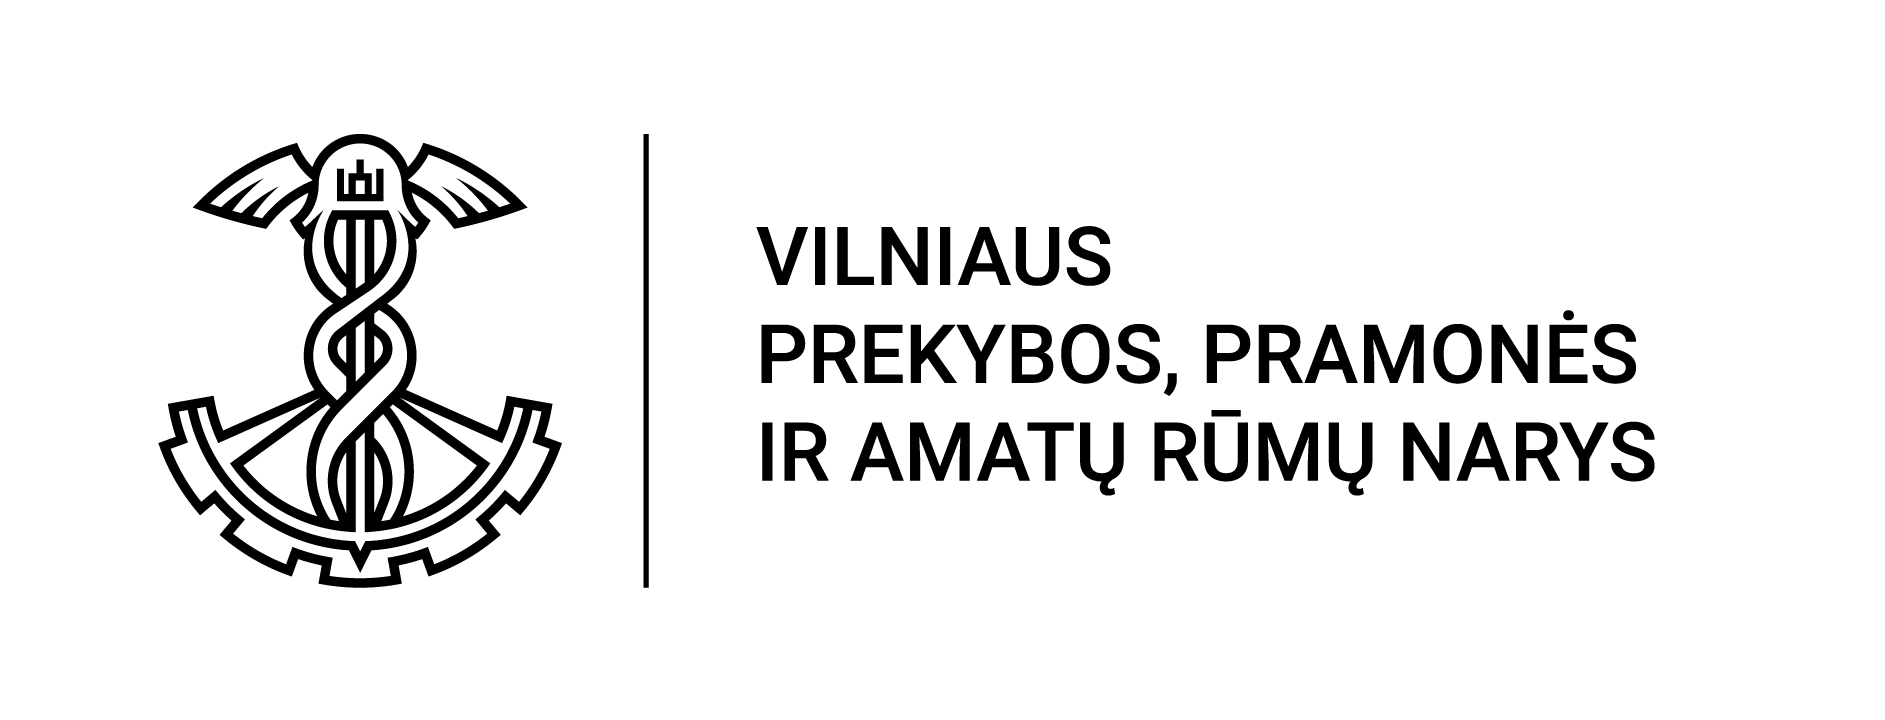 VPPAR